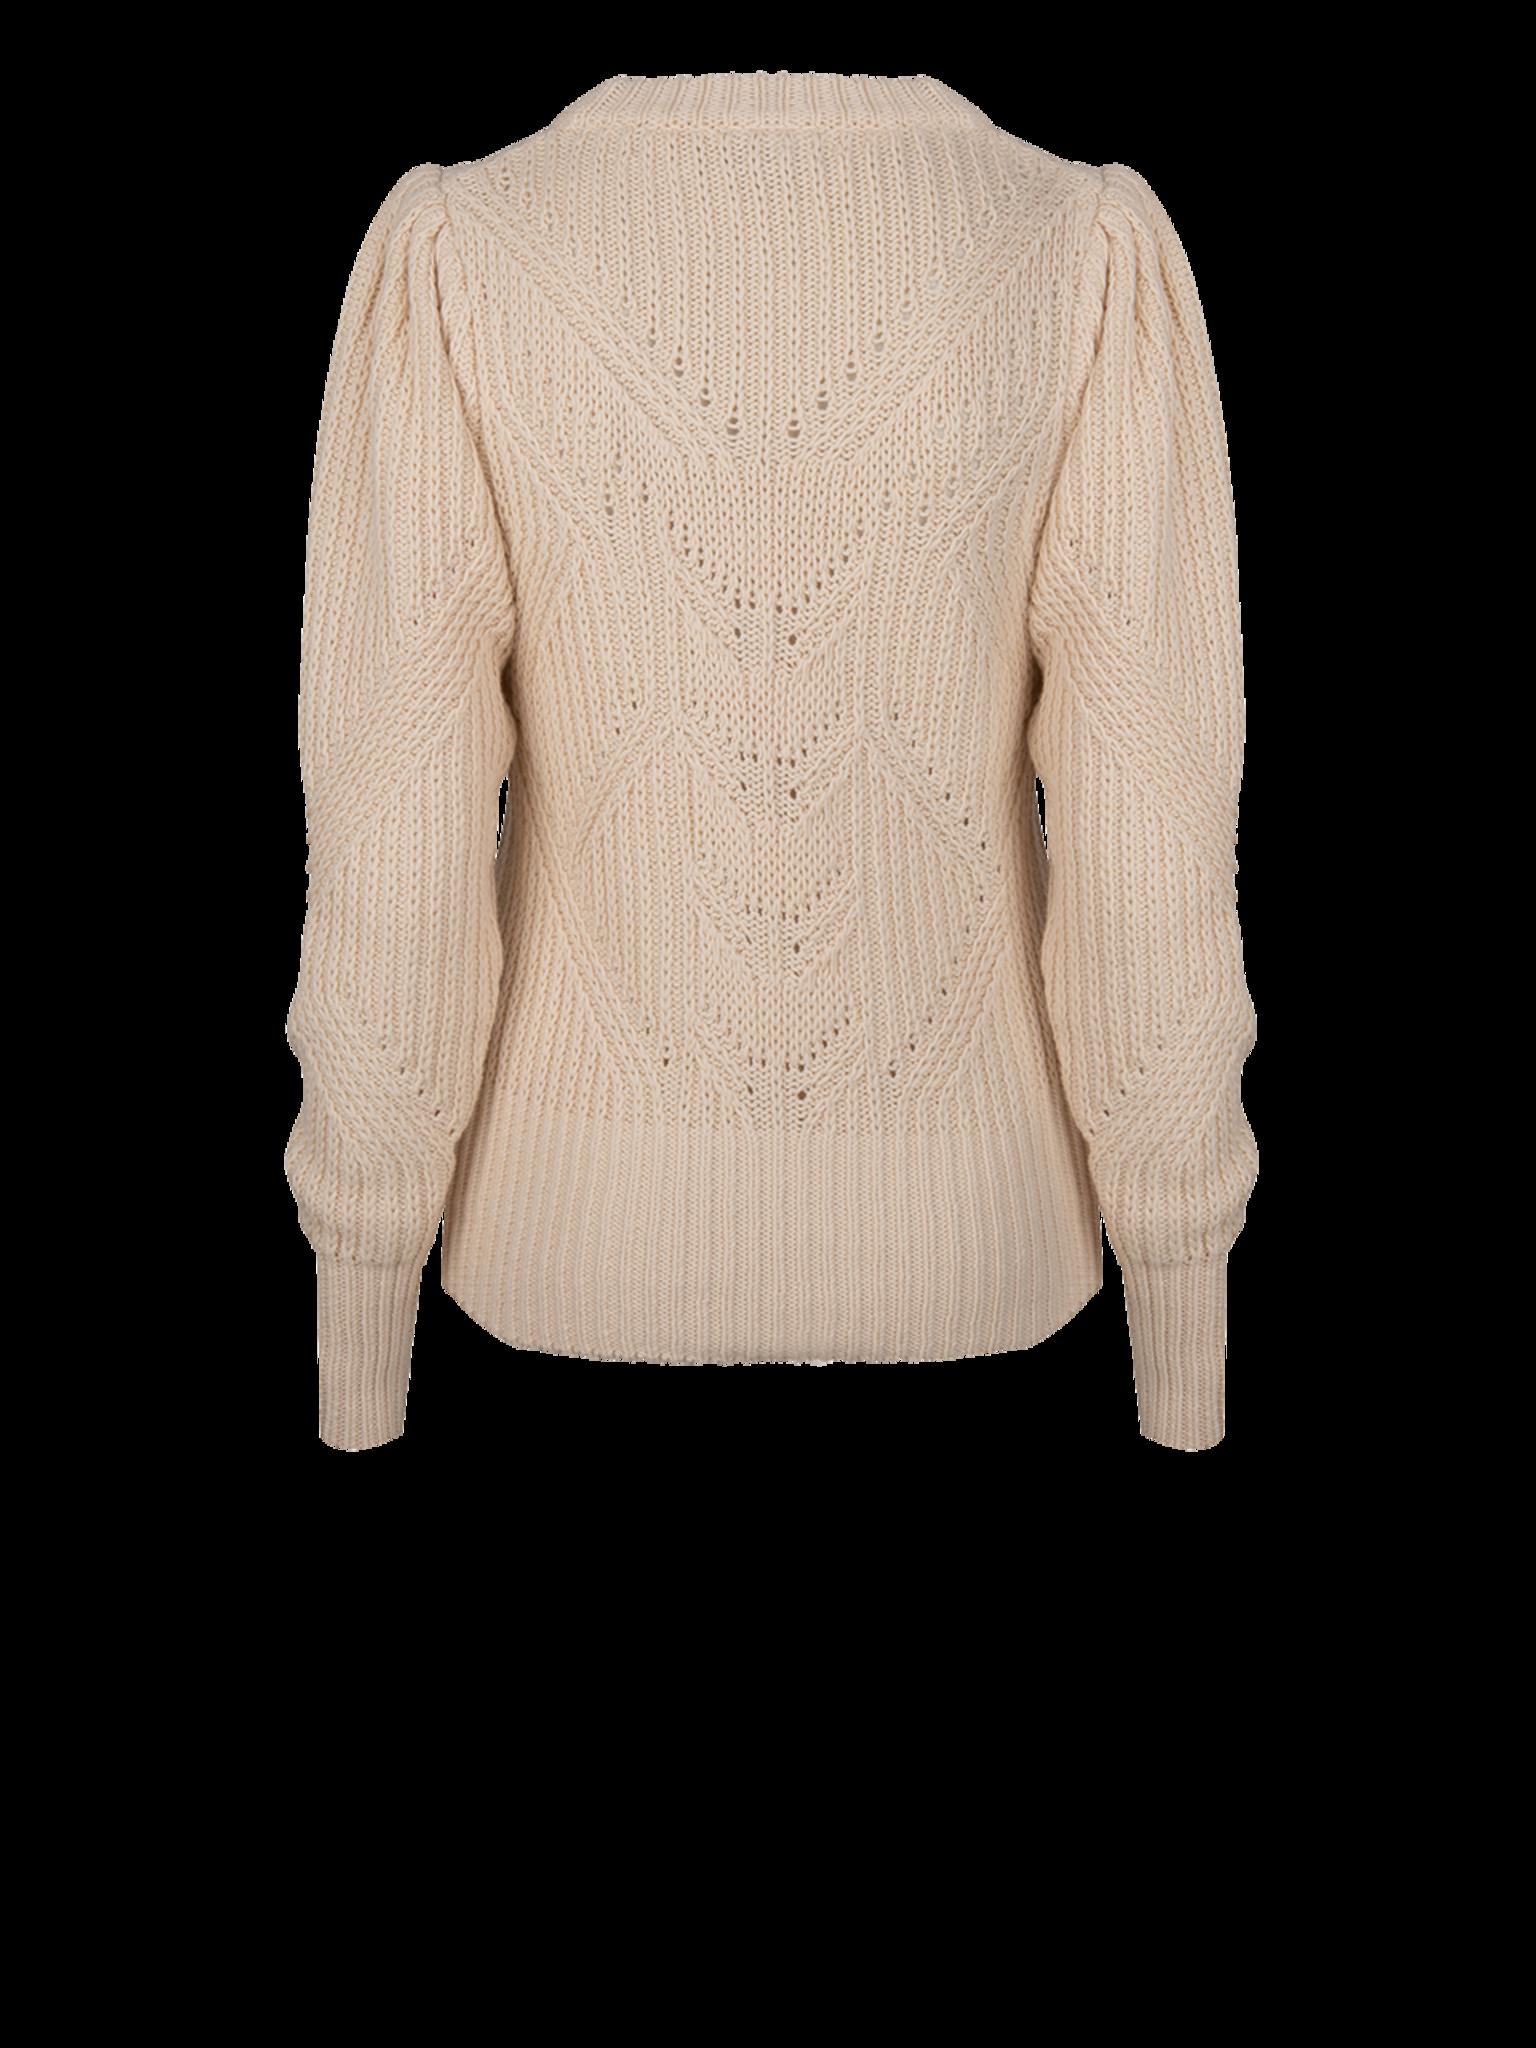 Dante 6 sweater 211402 CLEO-2